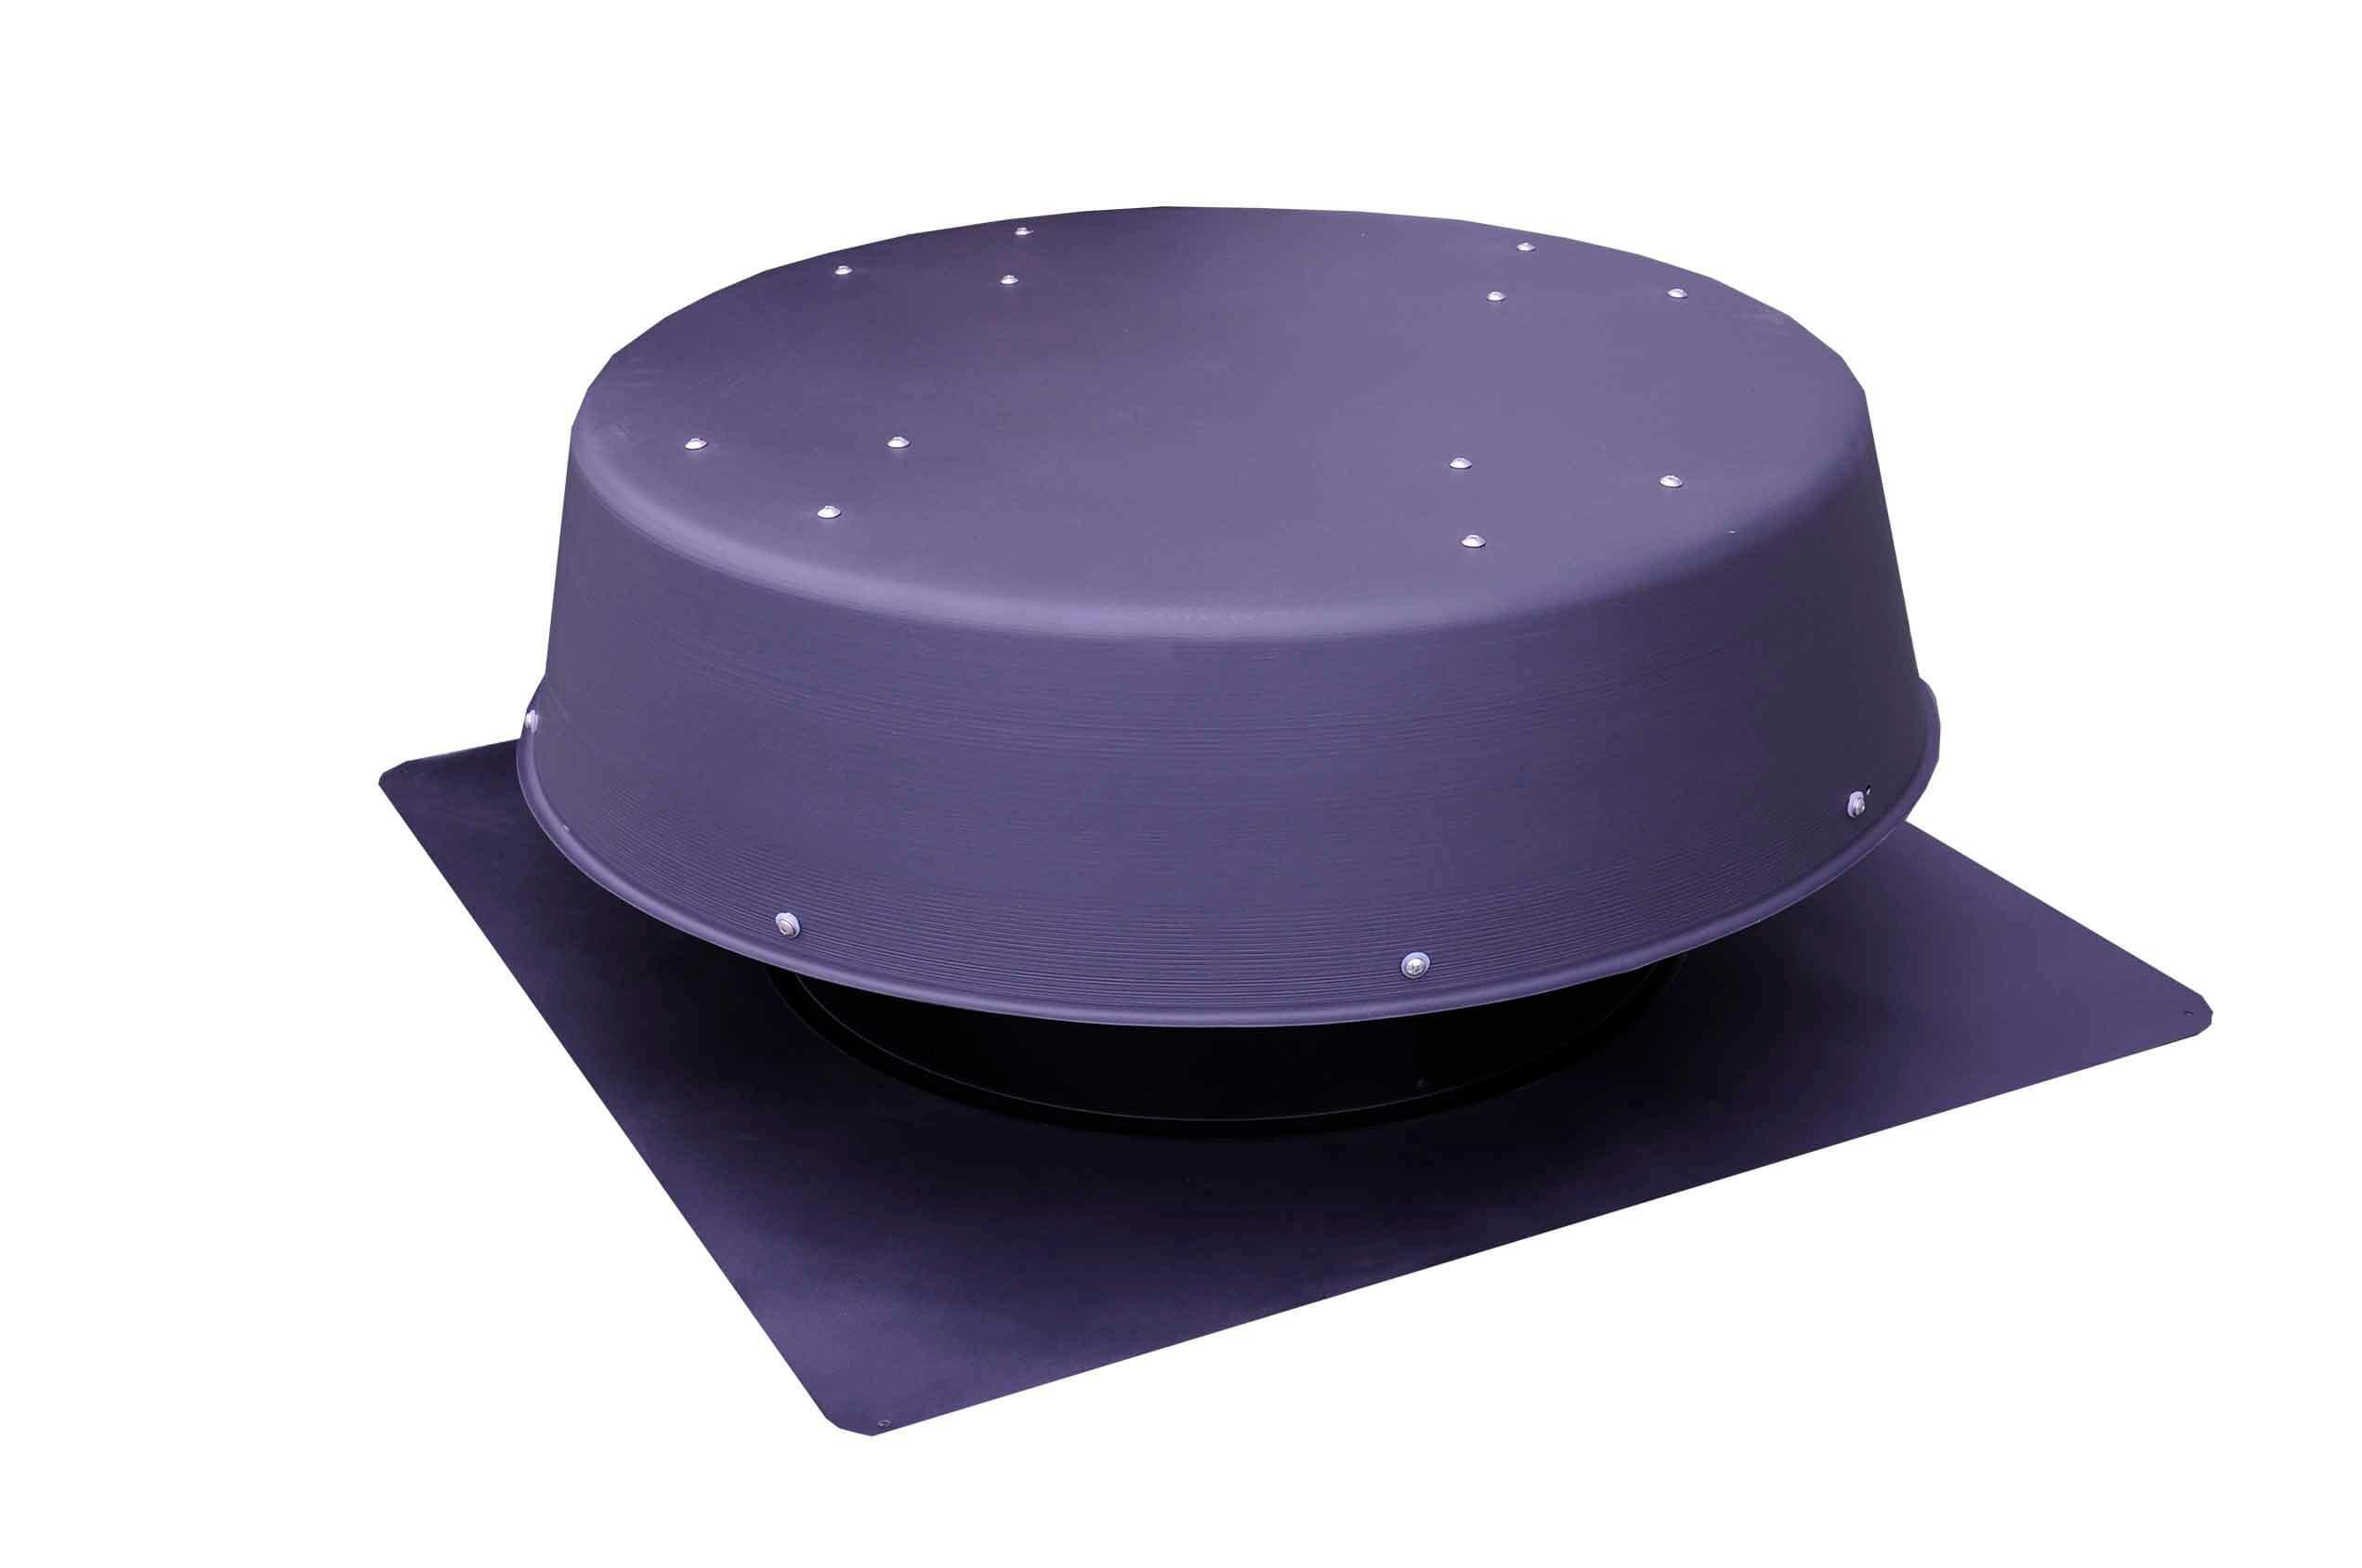 Commercial Solar Roof Ventilation Fan